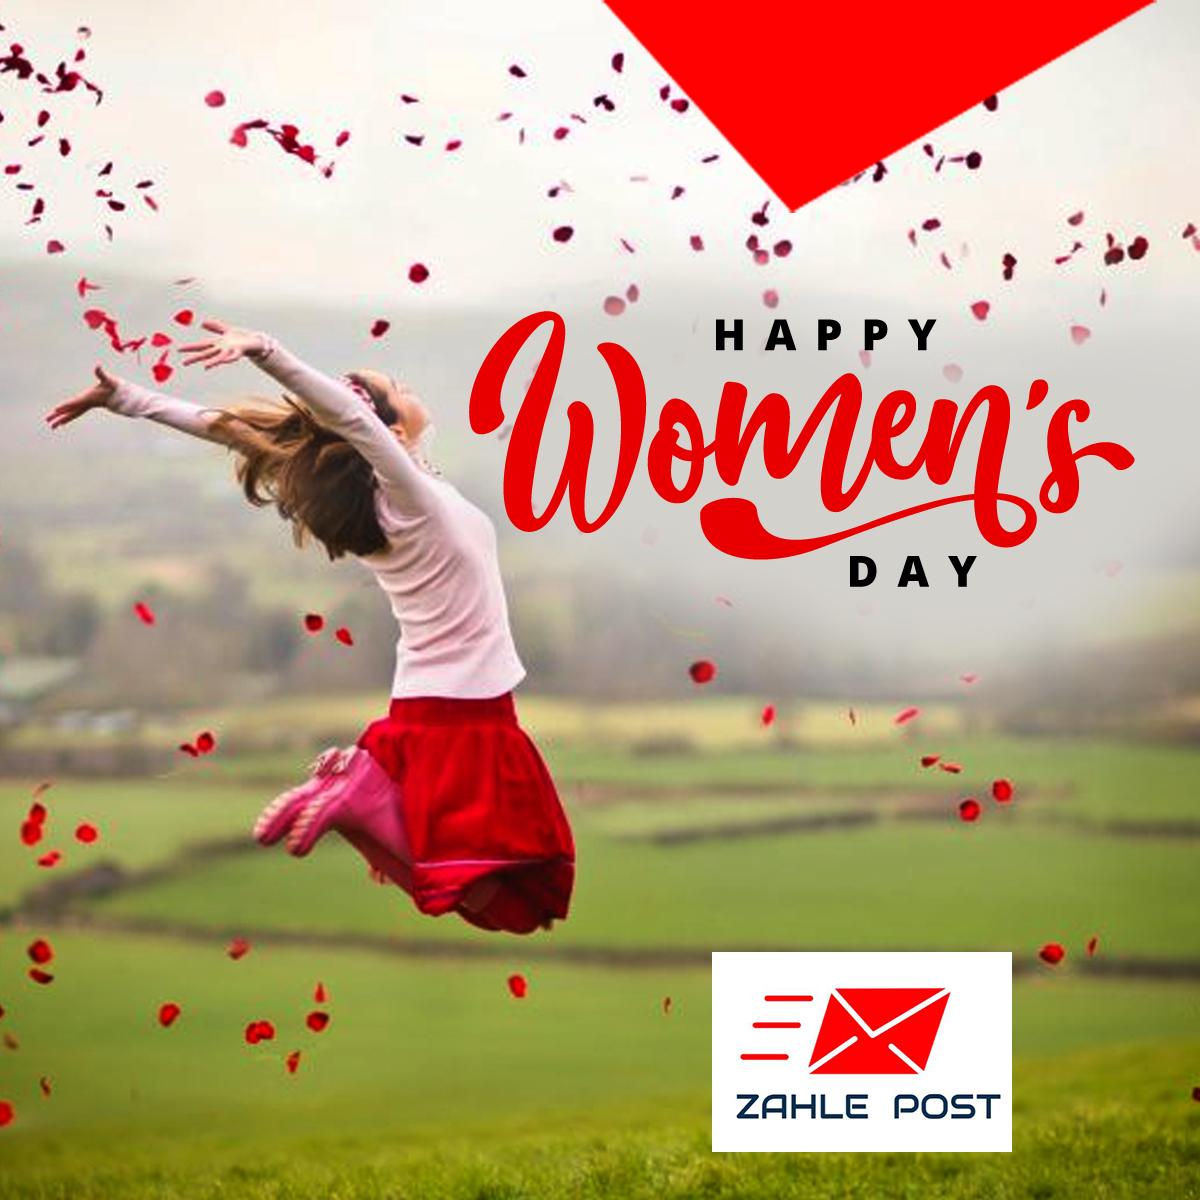 International Women's Day History